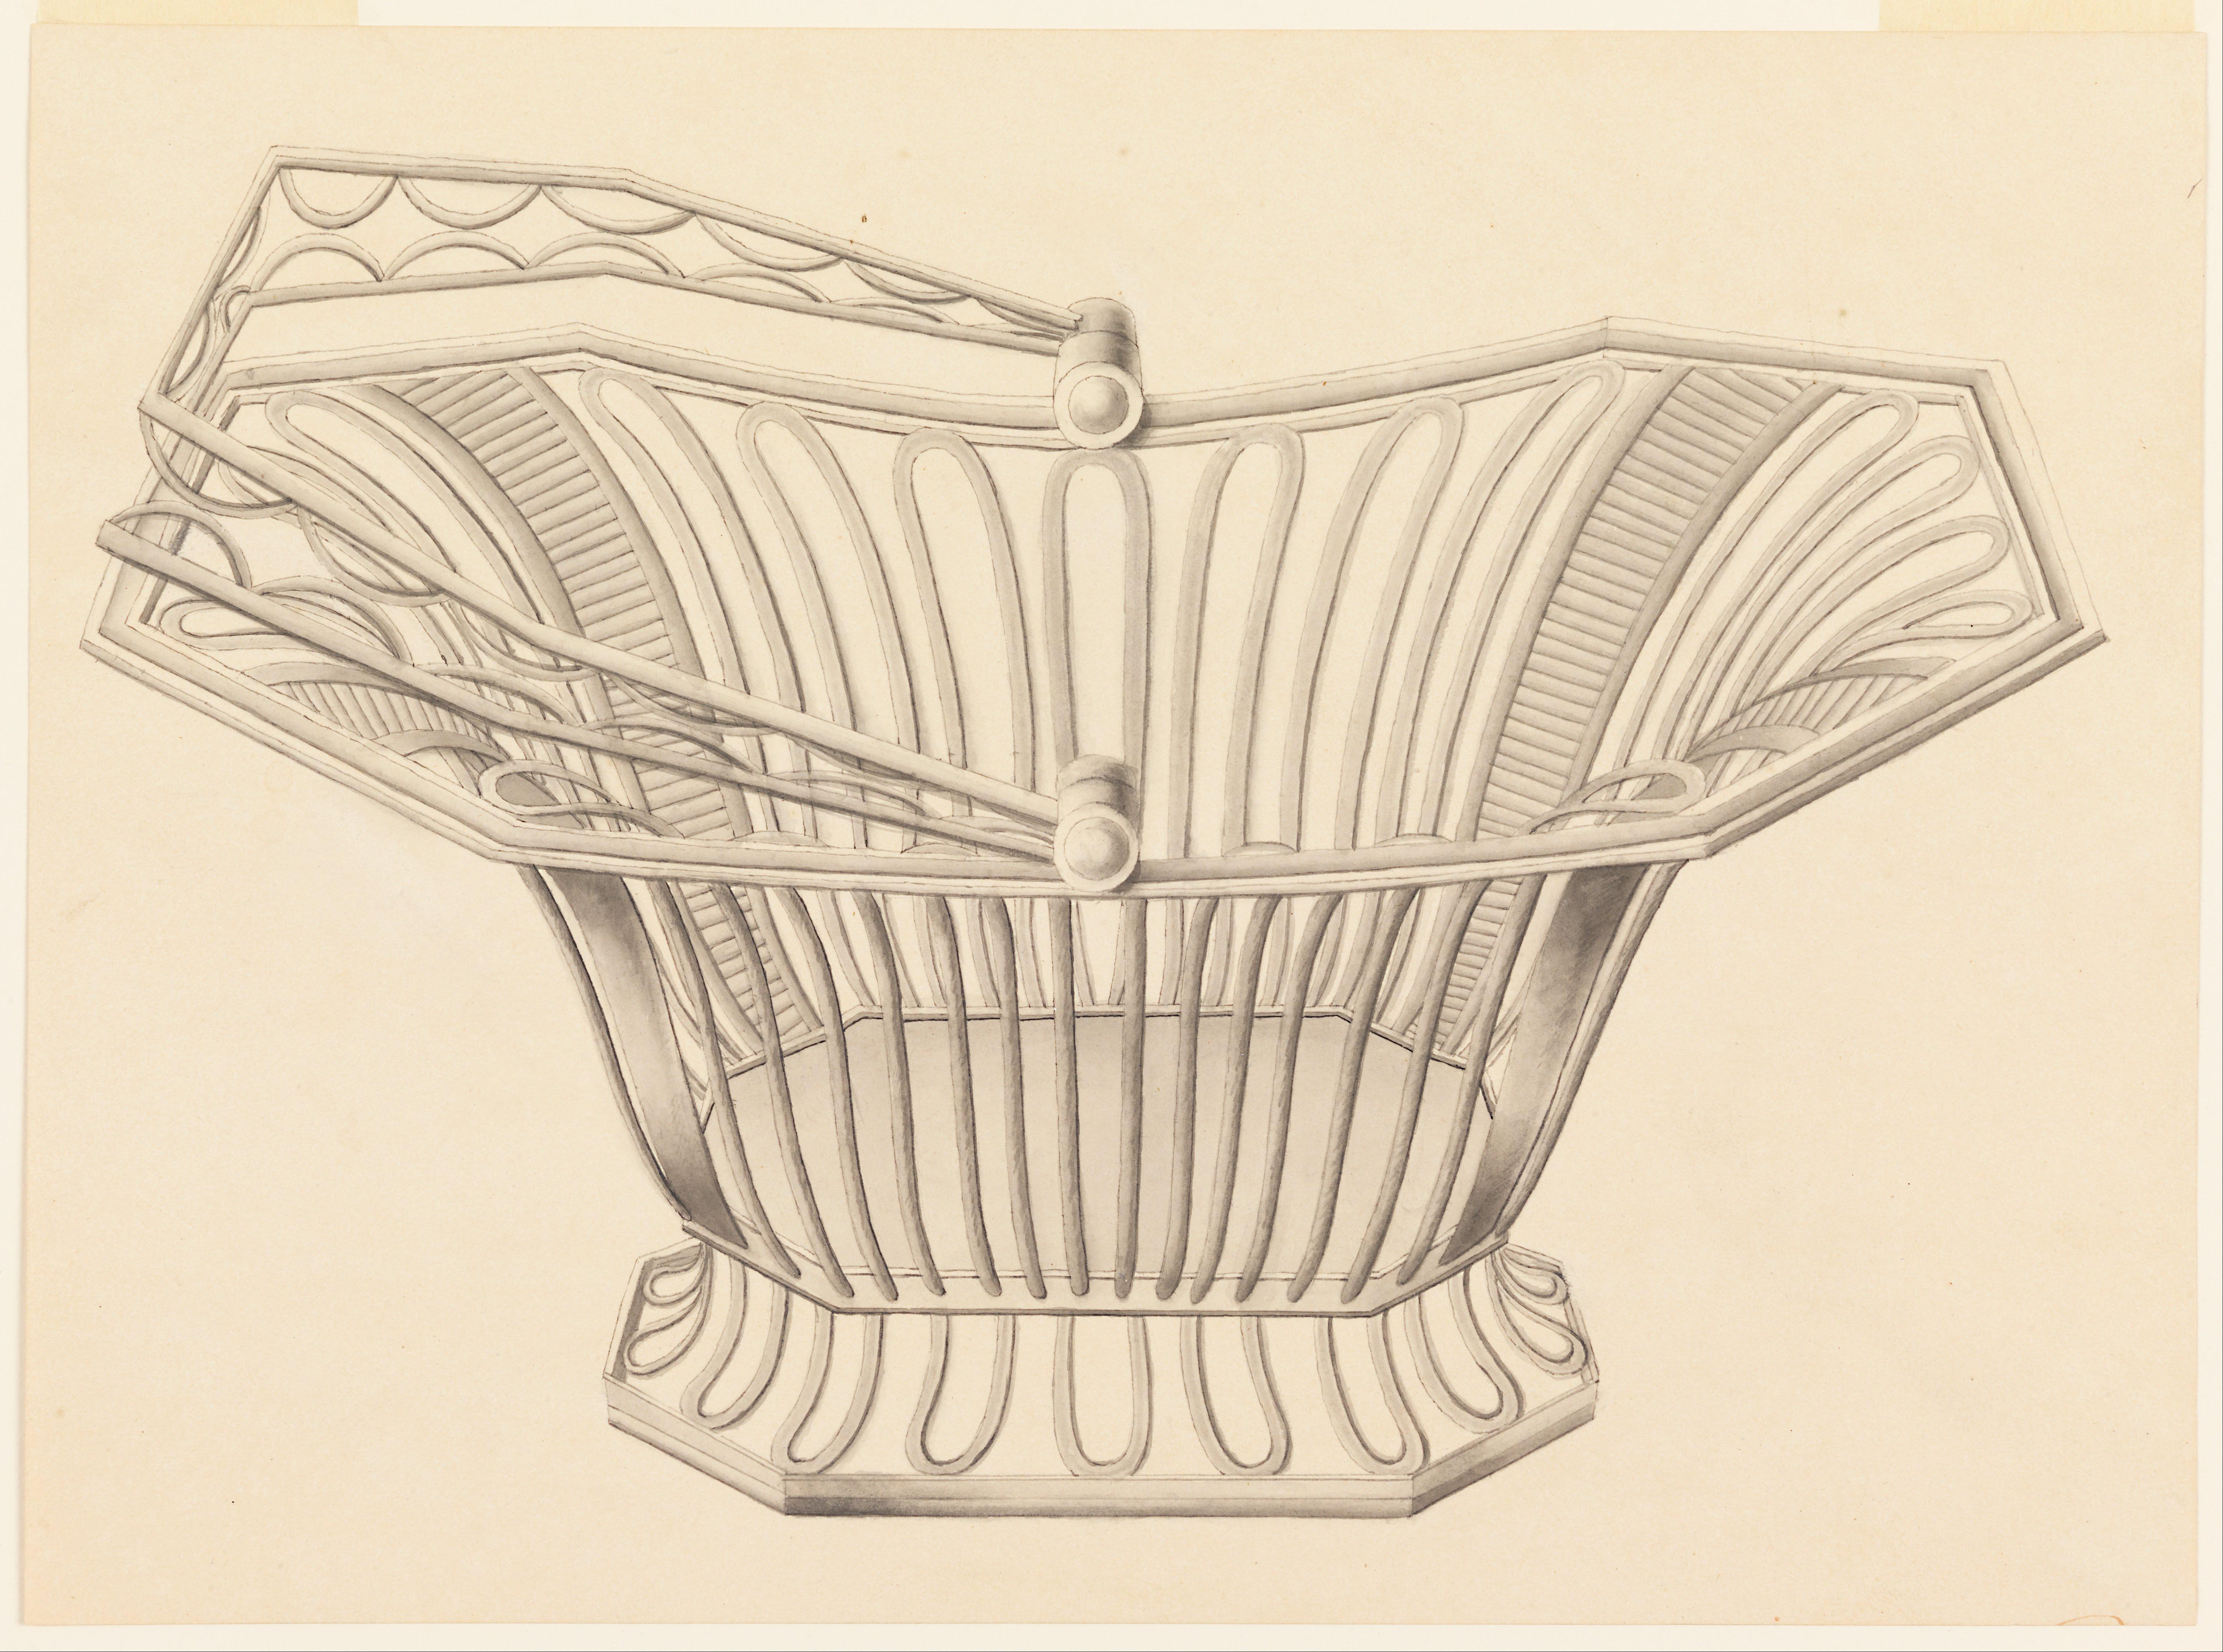 5781x4297 Filedesign For A Bread Basket